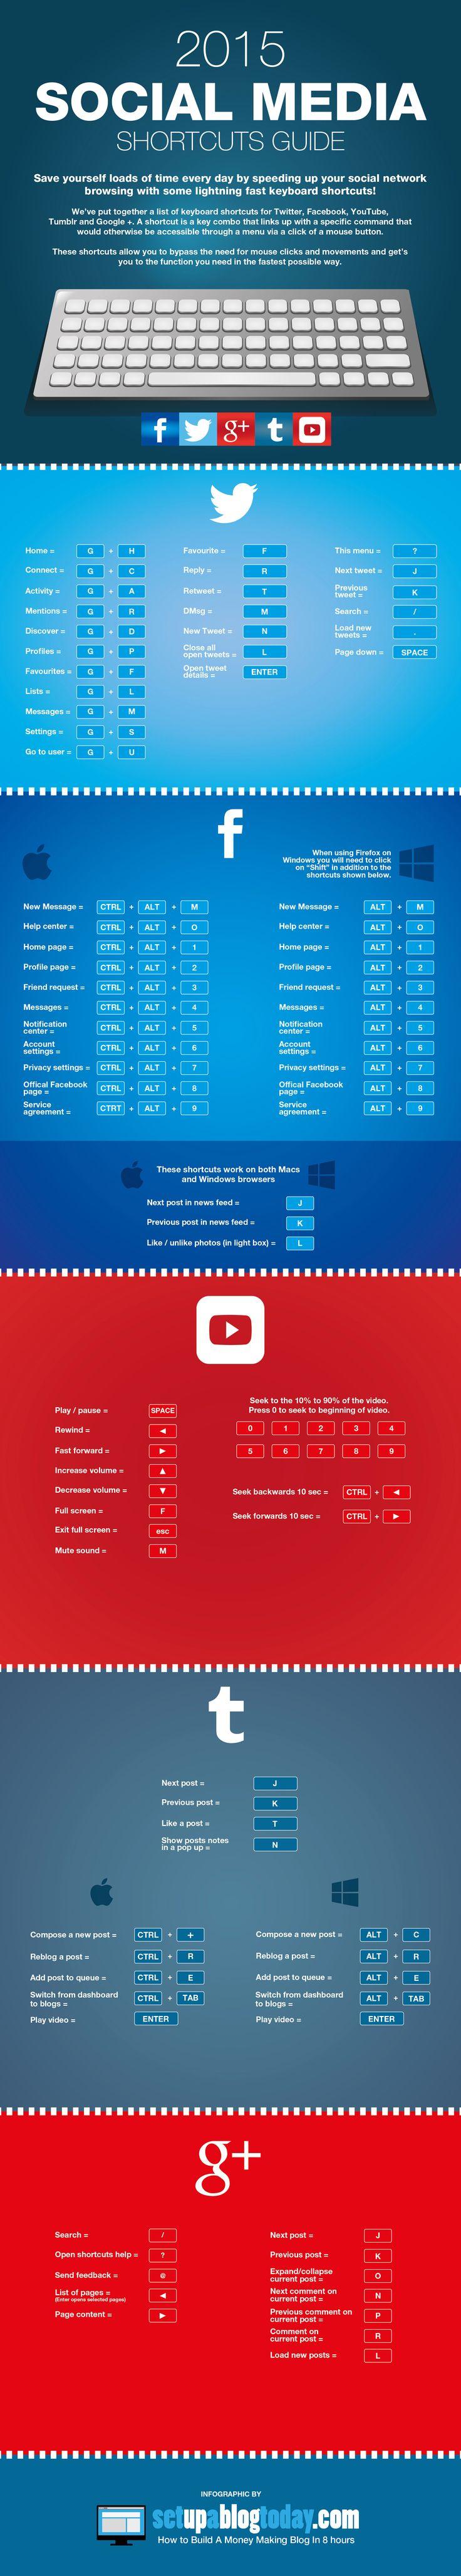 #SocialMedia Shortcut-Guide: So bewegst du dich schneller durch Facebook und Co.